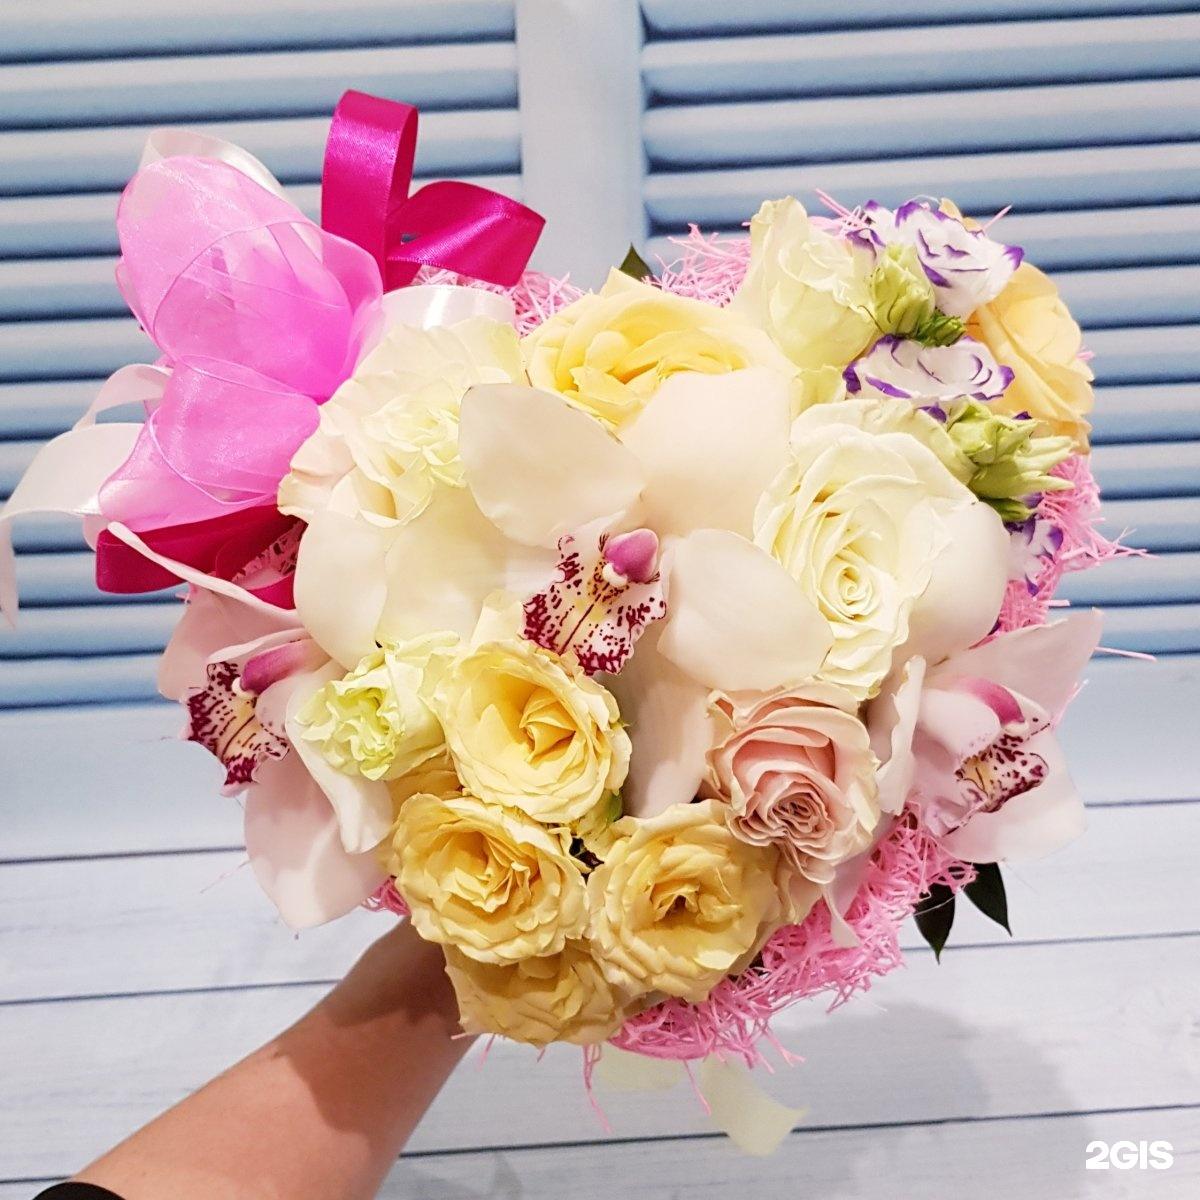 Заказ цветов в калуге, цветов школьная 301